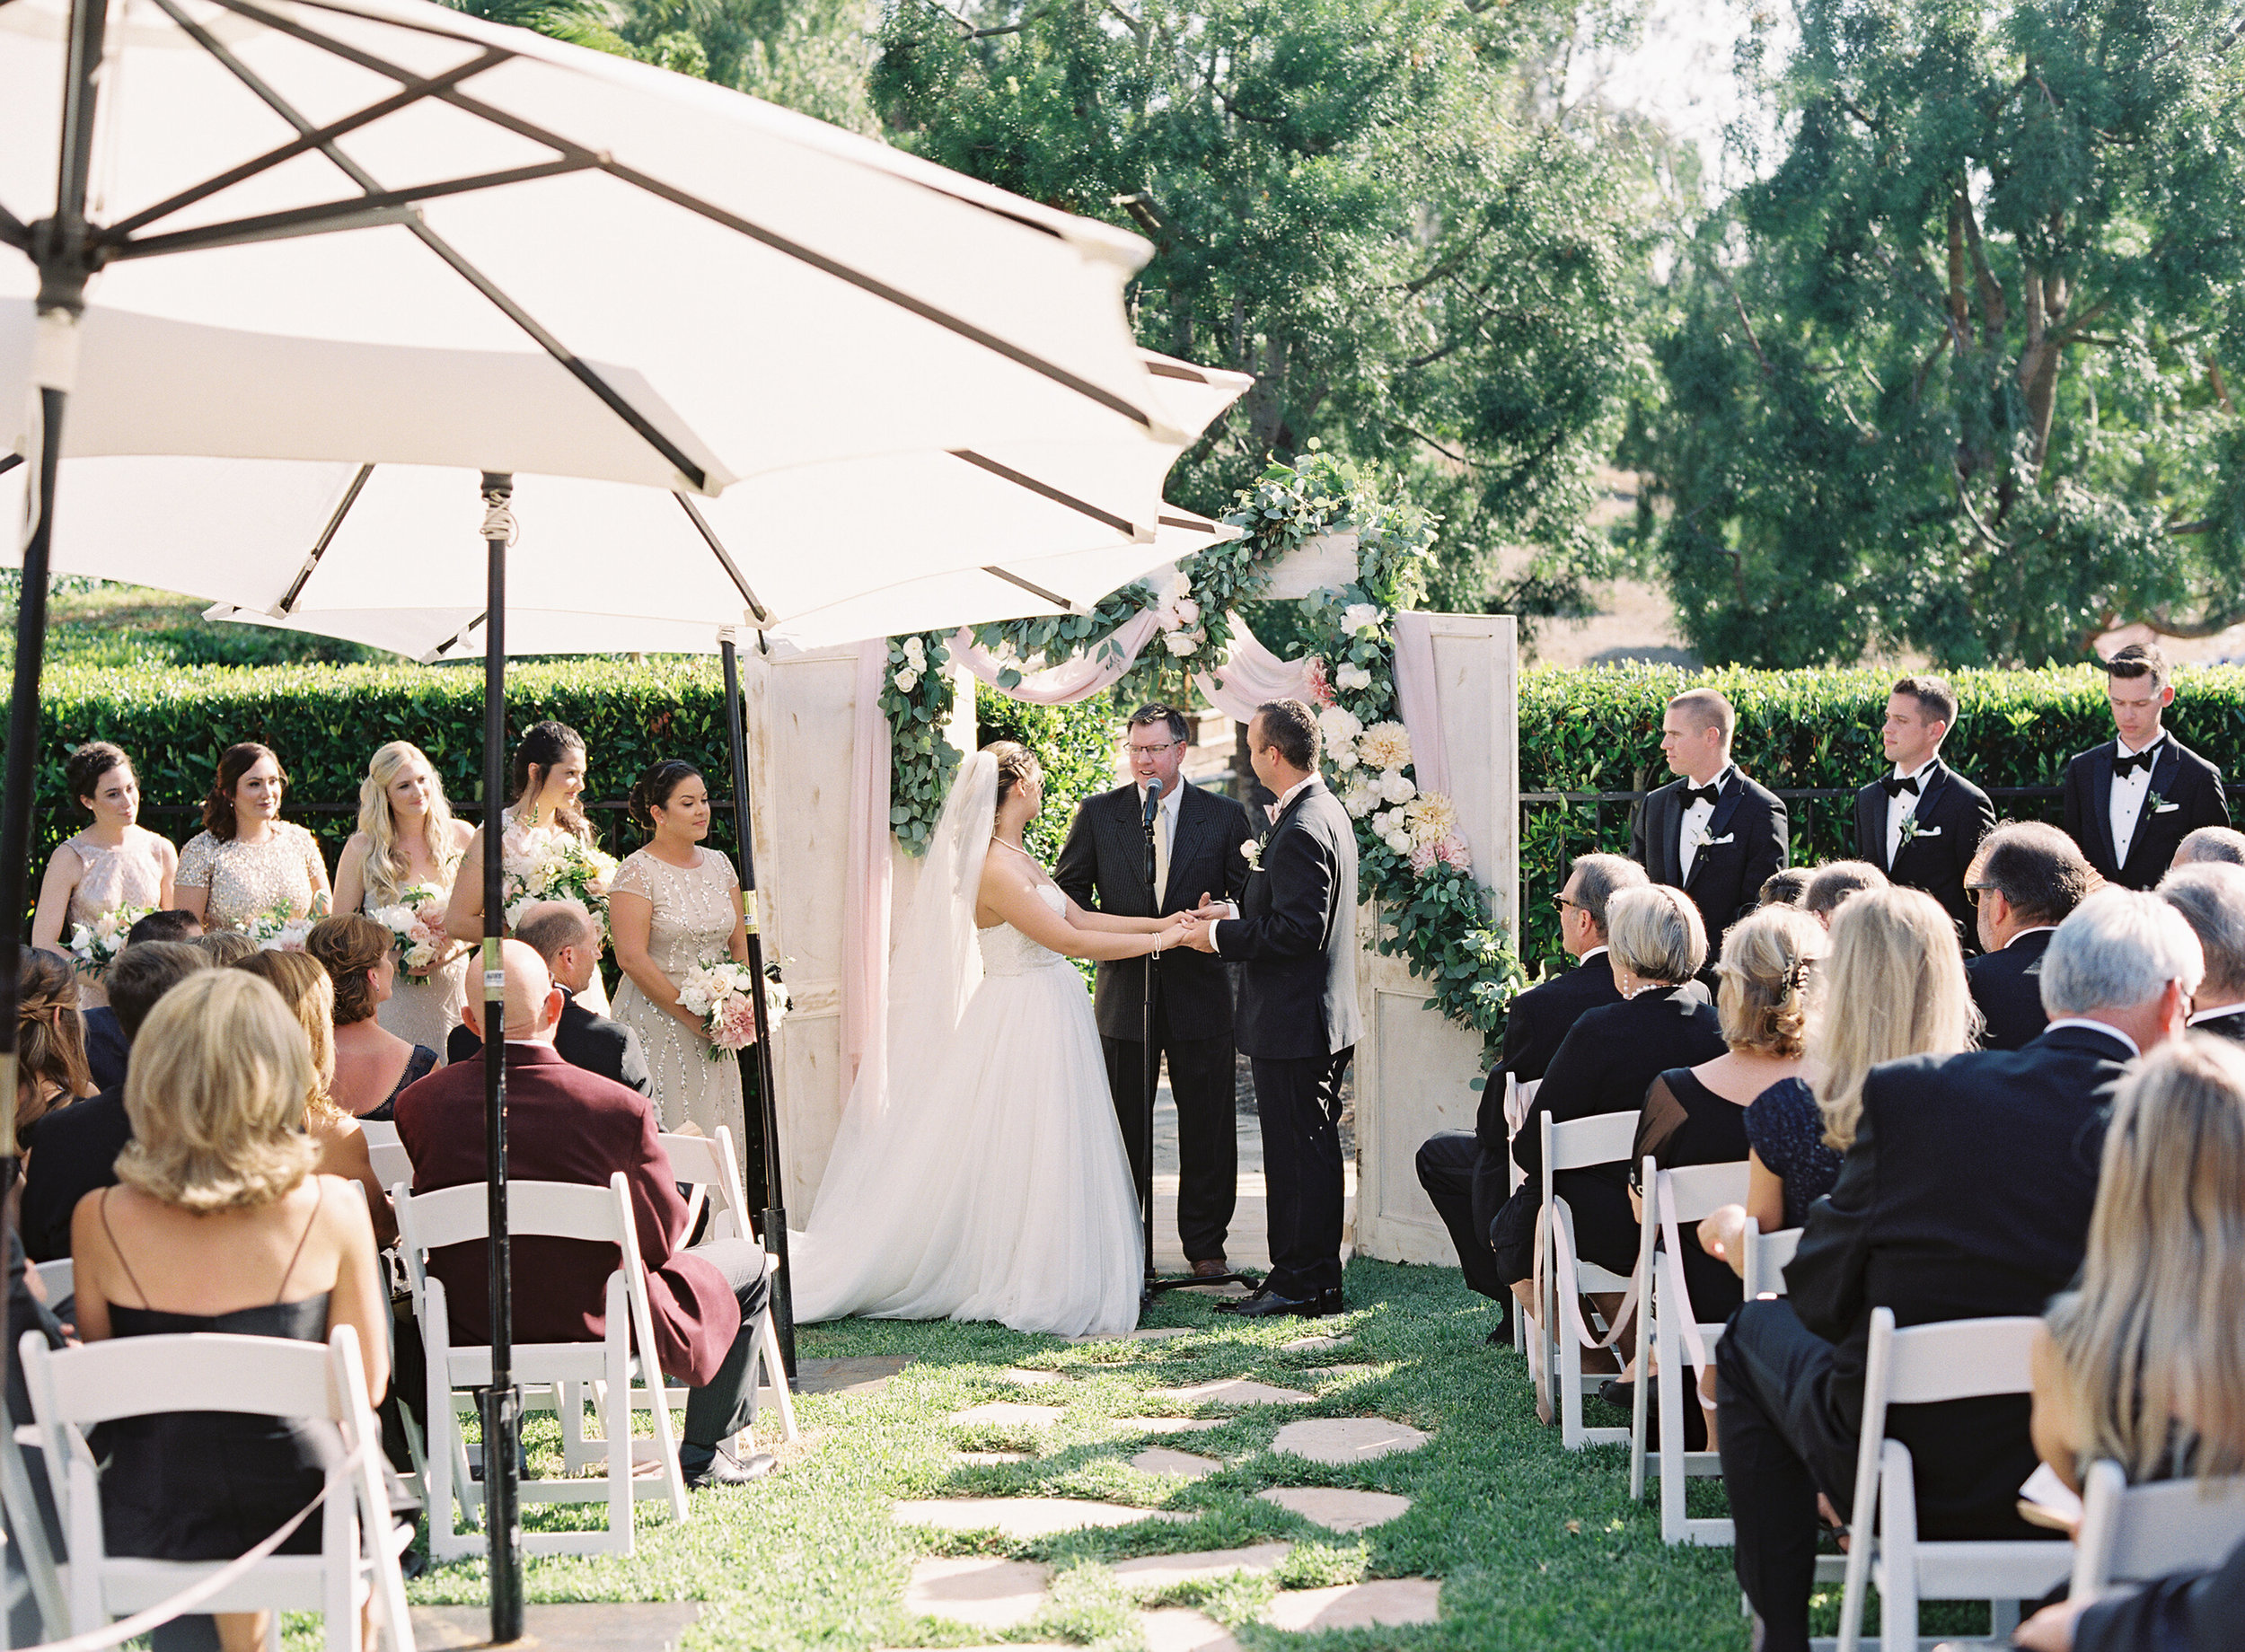 Braden-Hannah-Married-411.jpg